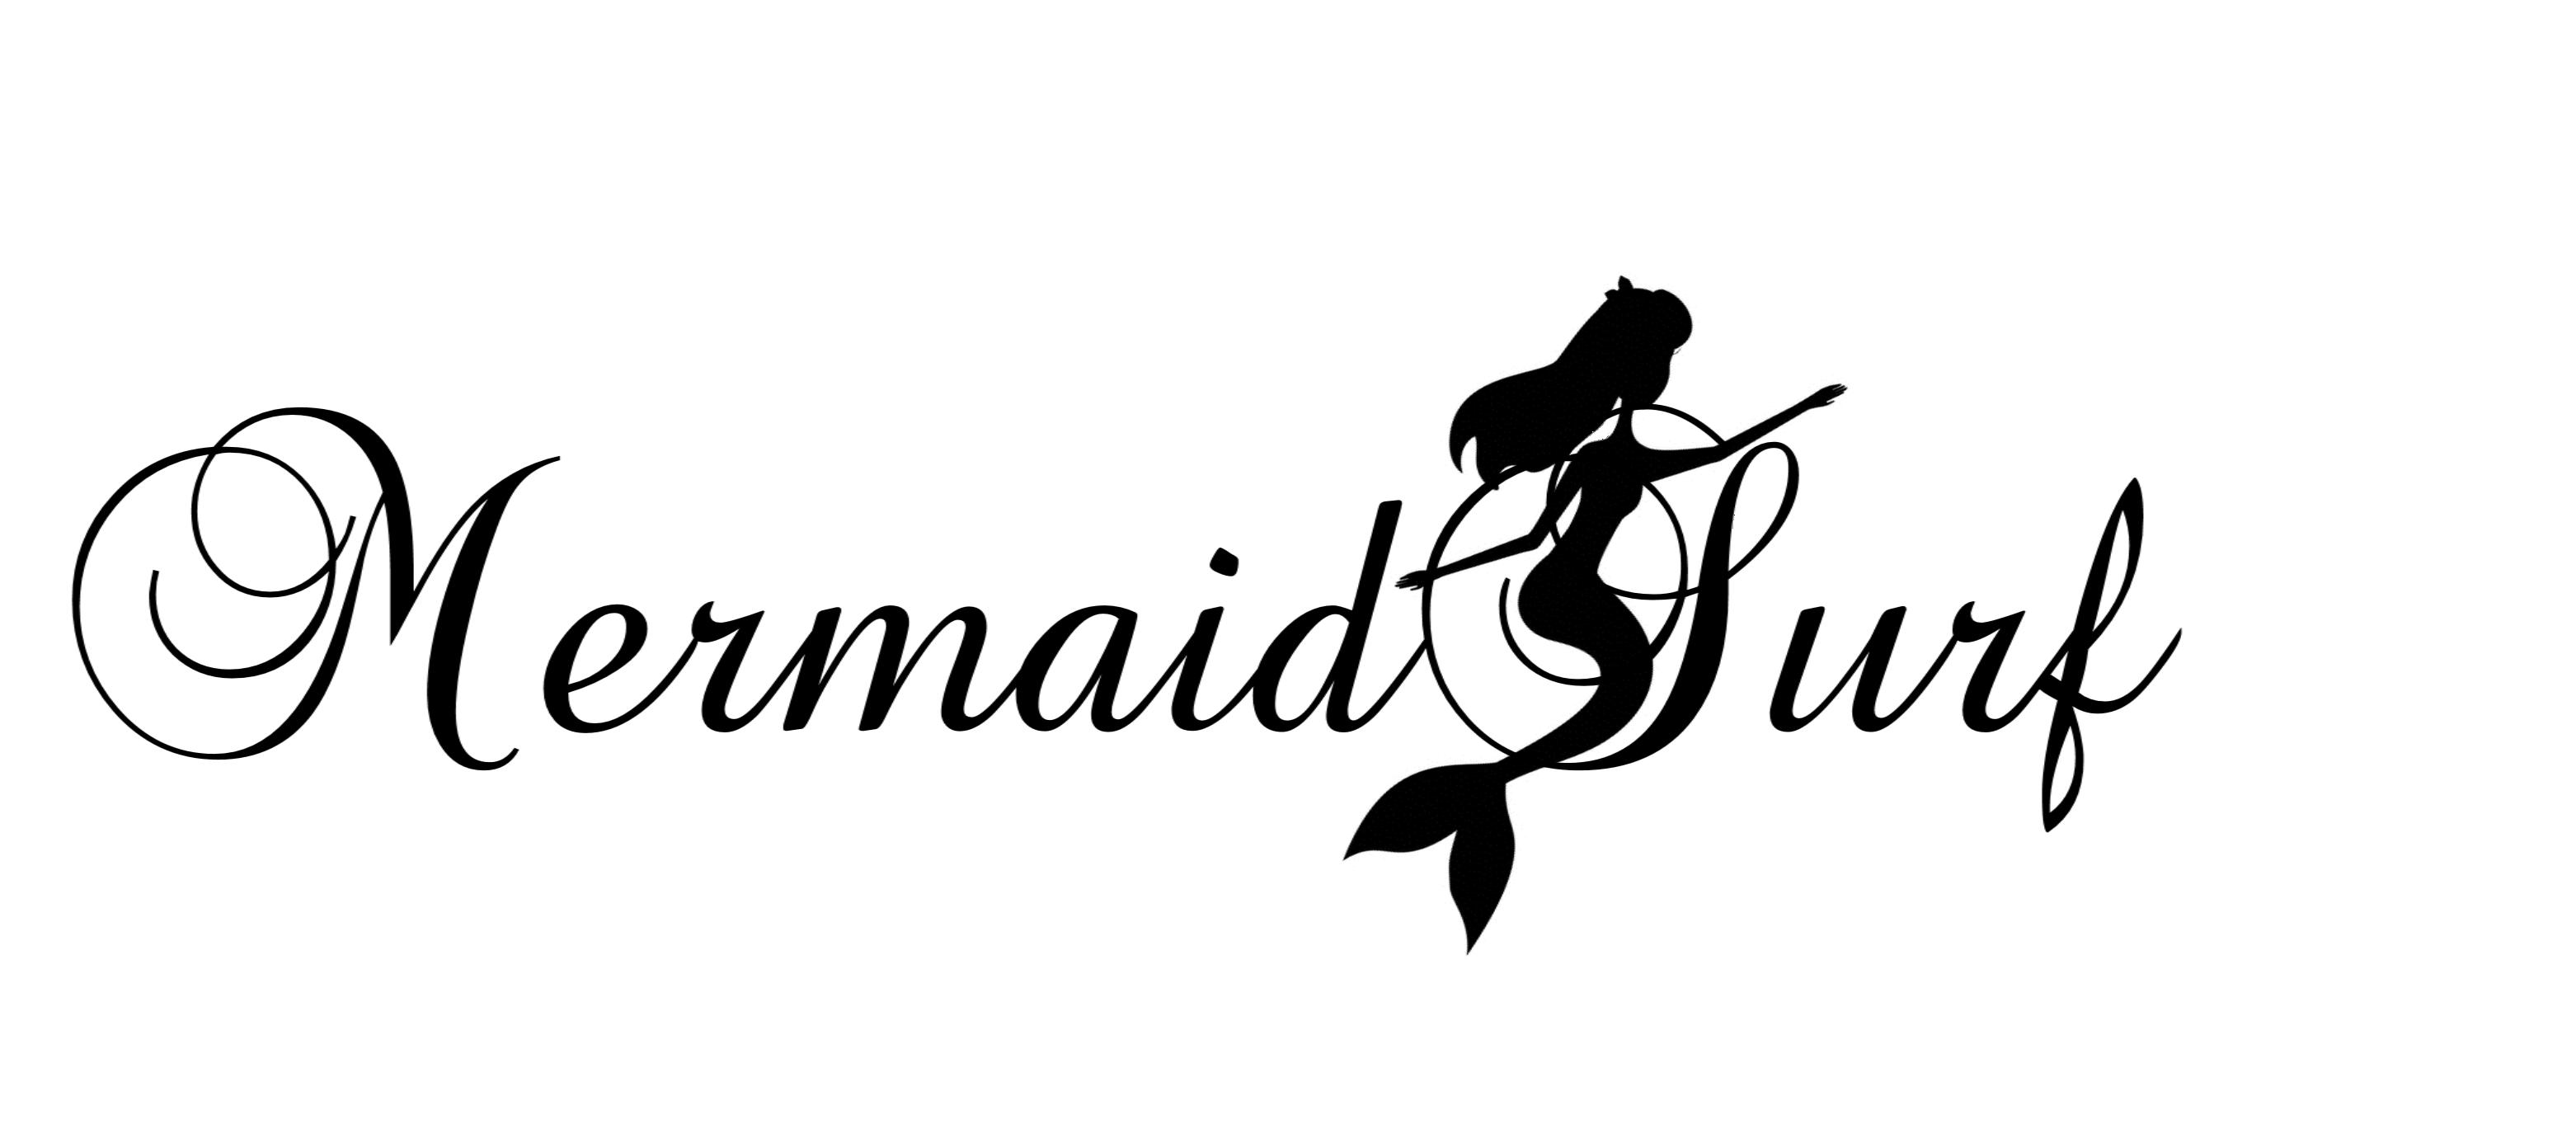 MermaidSurf(マーメイドサーフ)サーフィン専門パーソナルトレーニングジム|パーソナルトレーナーおぜきとしあき(尾関紀篤)